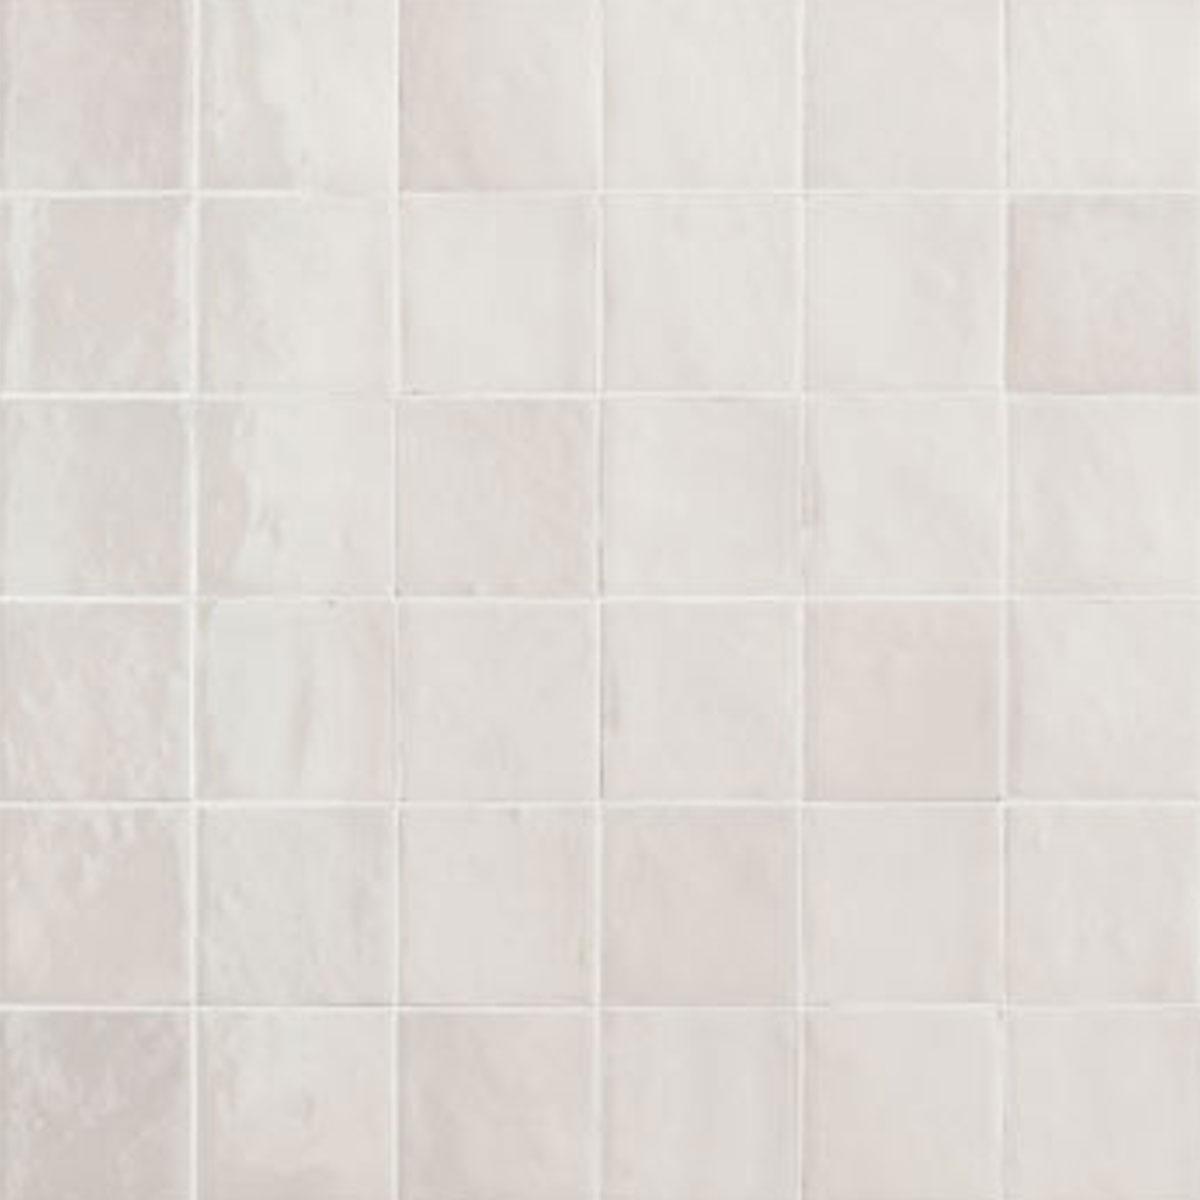 Zellige - Gesso - Handmade Look Tiles - Stone3 Brisbane